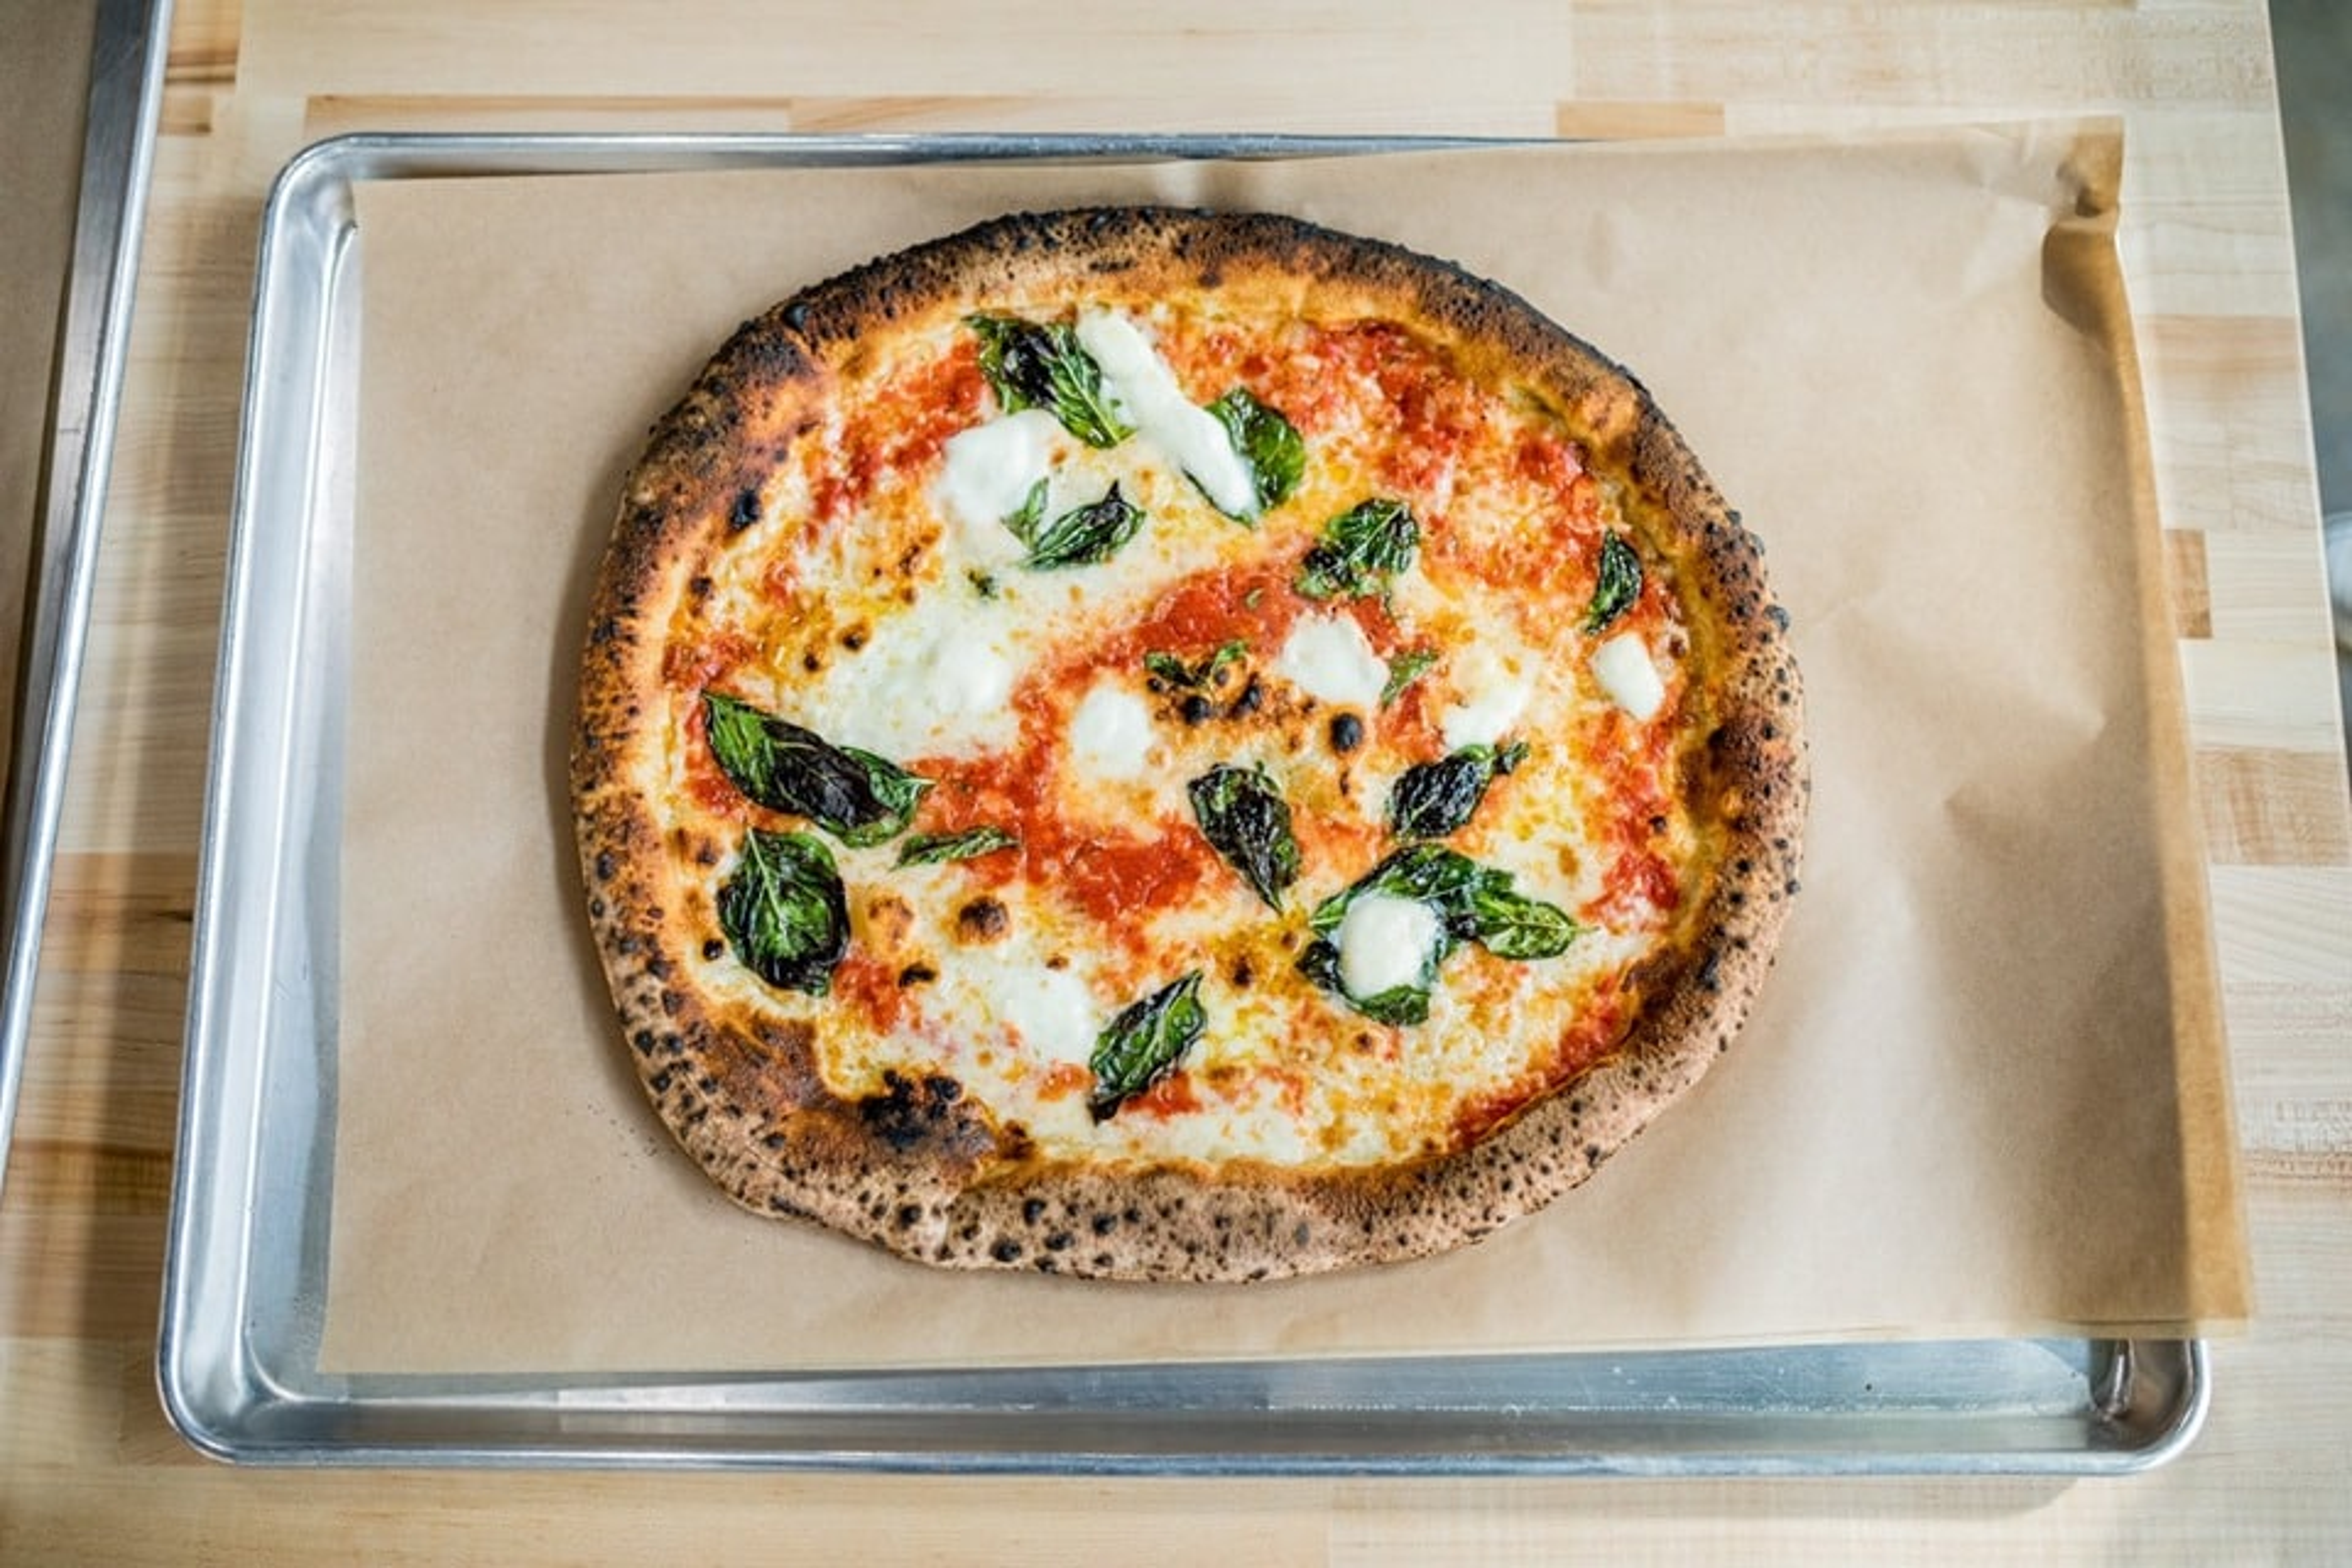 Best pizza in Winston-Salem, North Carolina